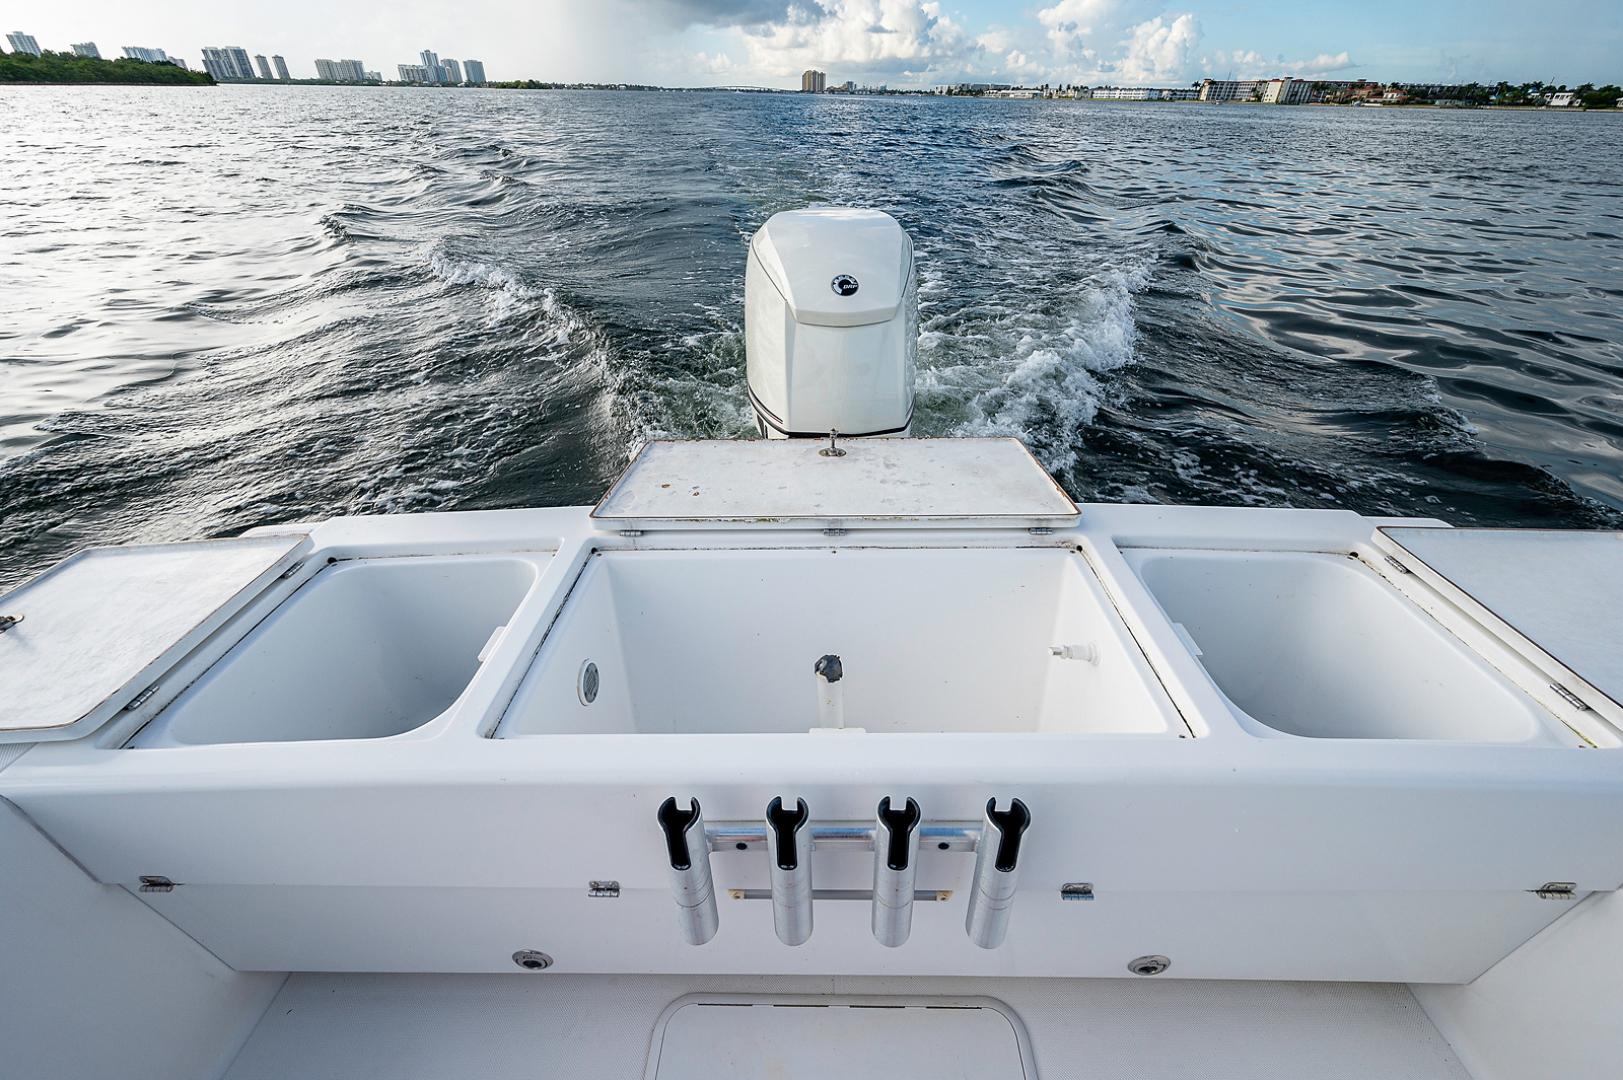 Ocean Master 2013-27 Ocean Master Palm Beach-Florida-United States-Cockpit-1501367 | Thumbnail